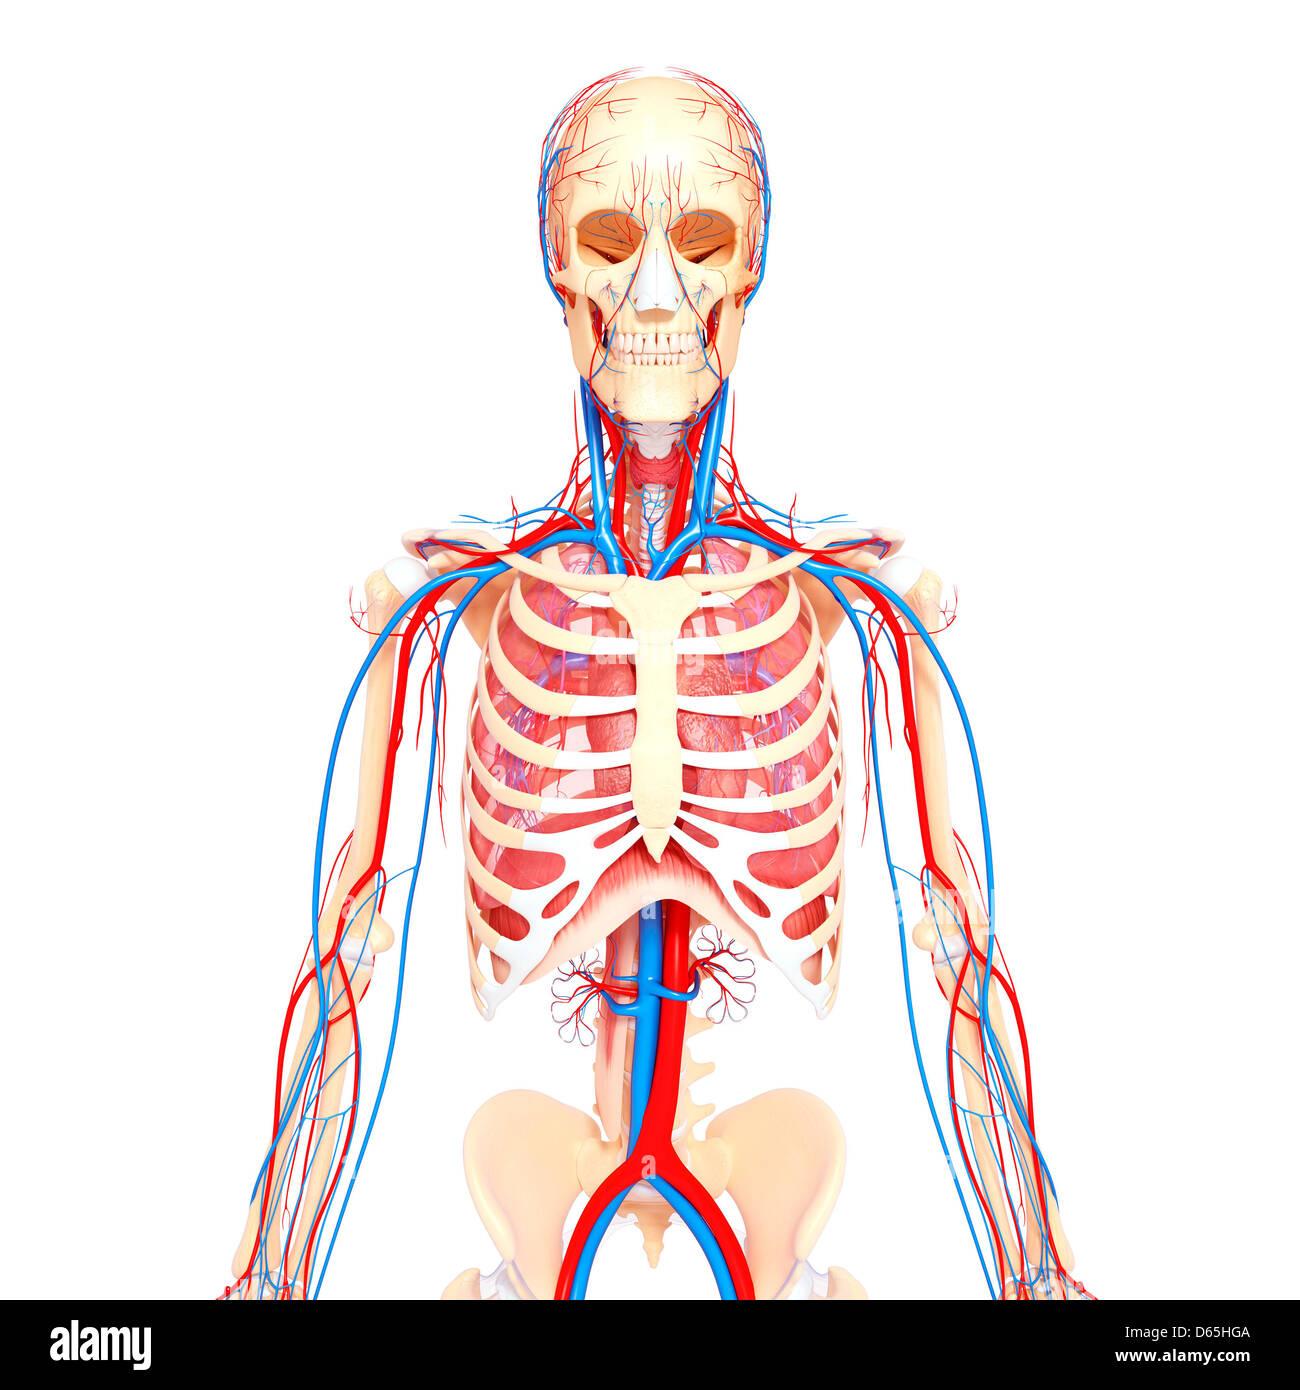 Ziemlich Anatomie Brustkorb Organe Fotos - Anatomie Ideen - finotti.info